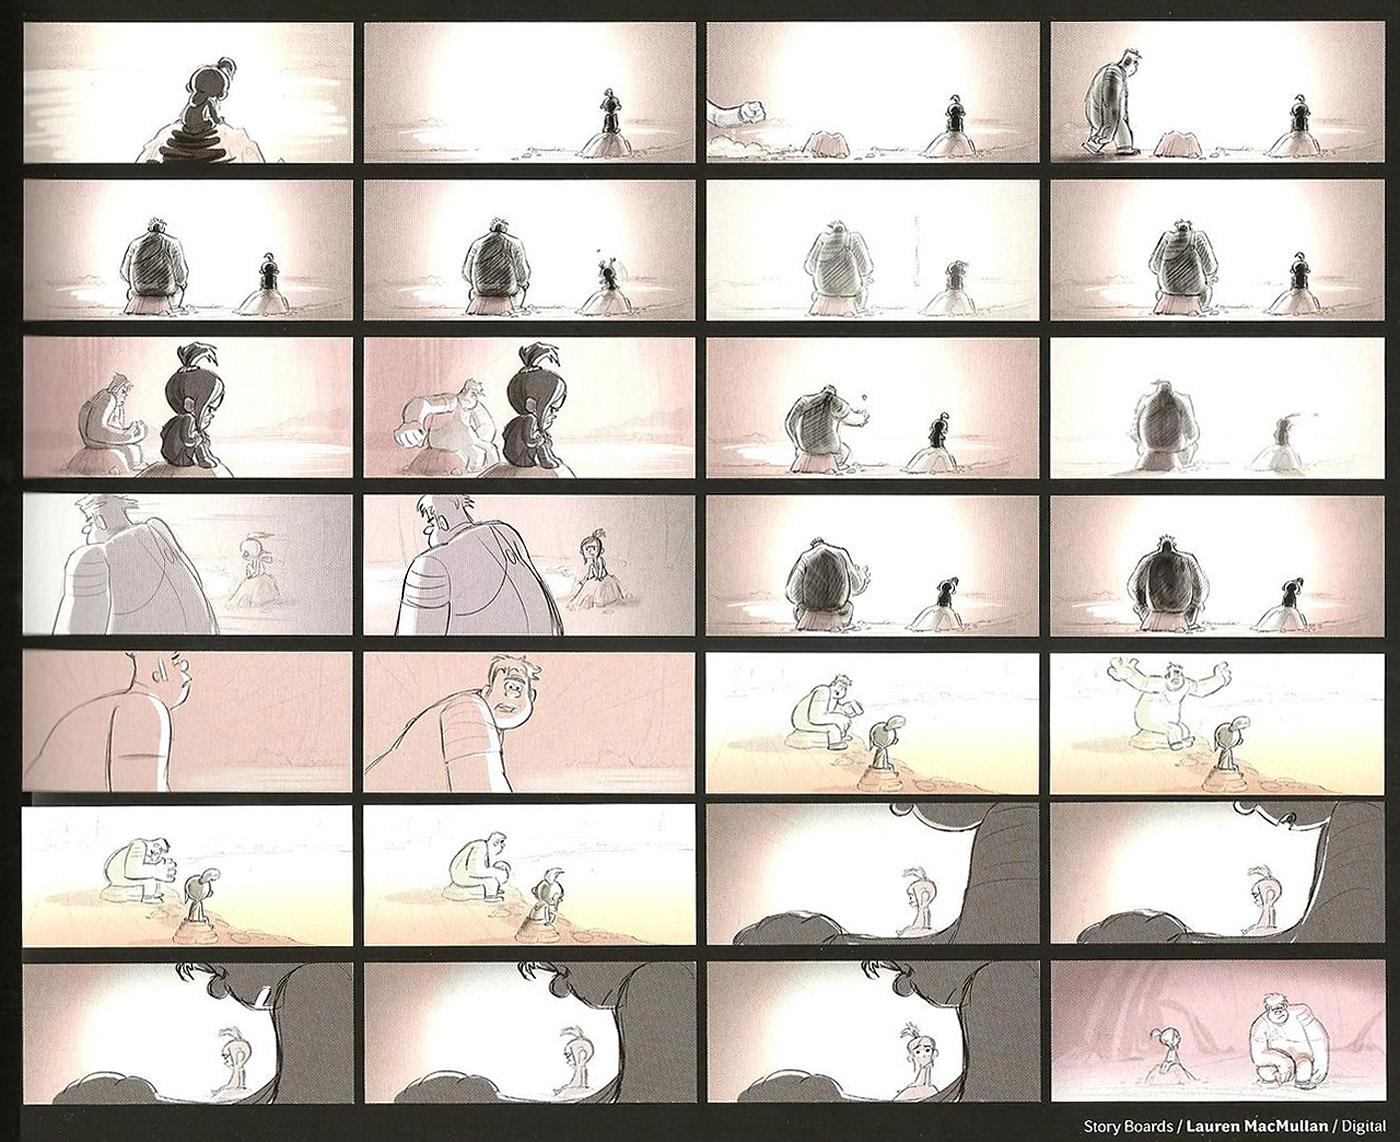 26-The-Art-of-Wreck-It-Ralph-Storyboards-lauren-macmullan.jpg